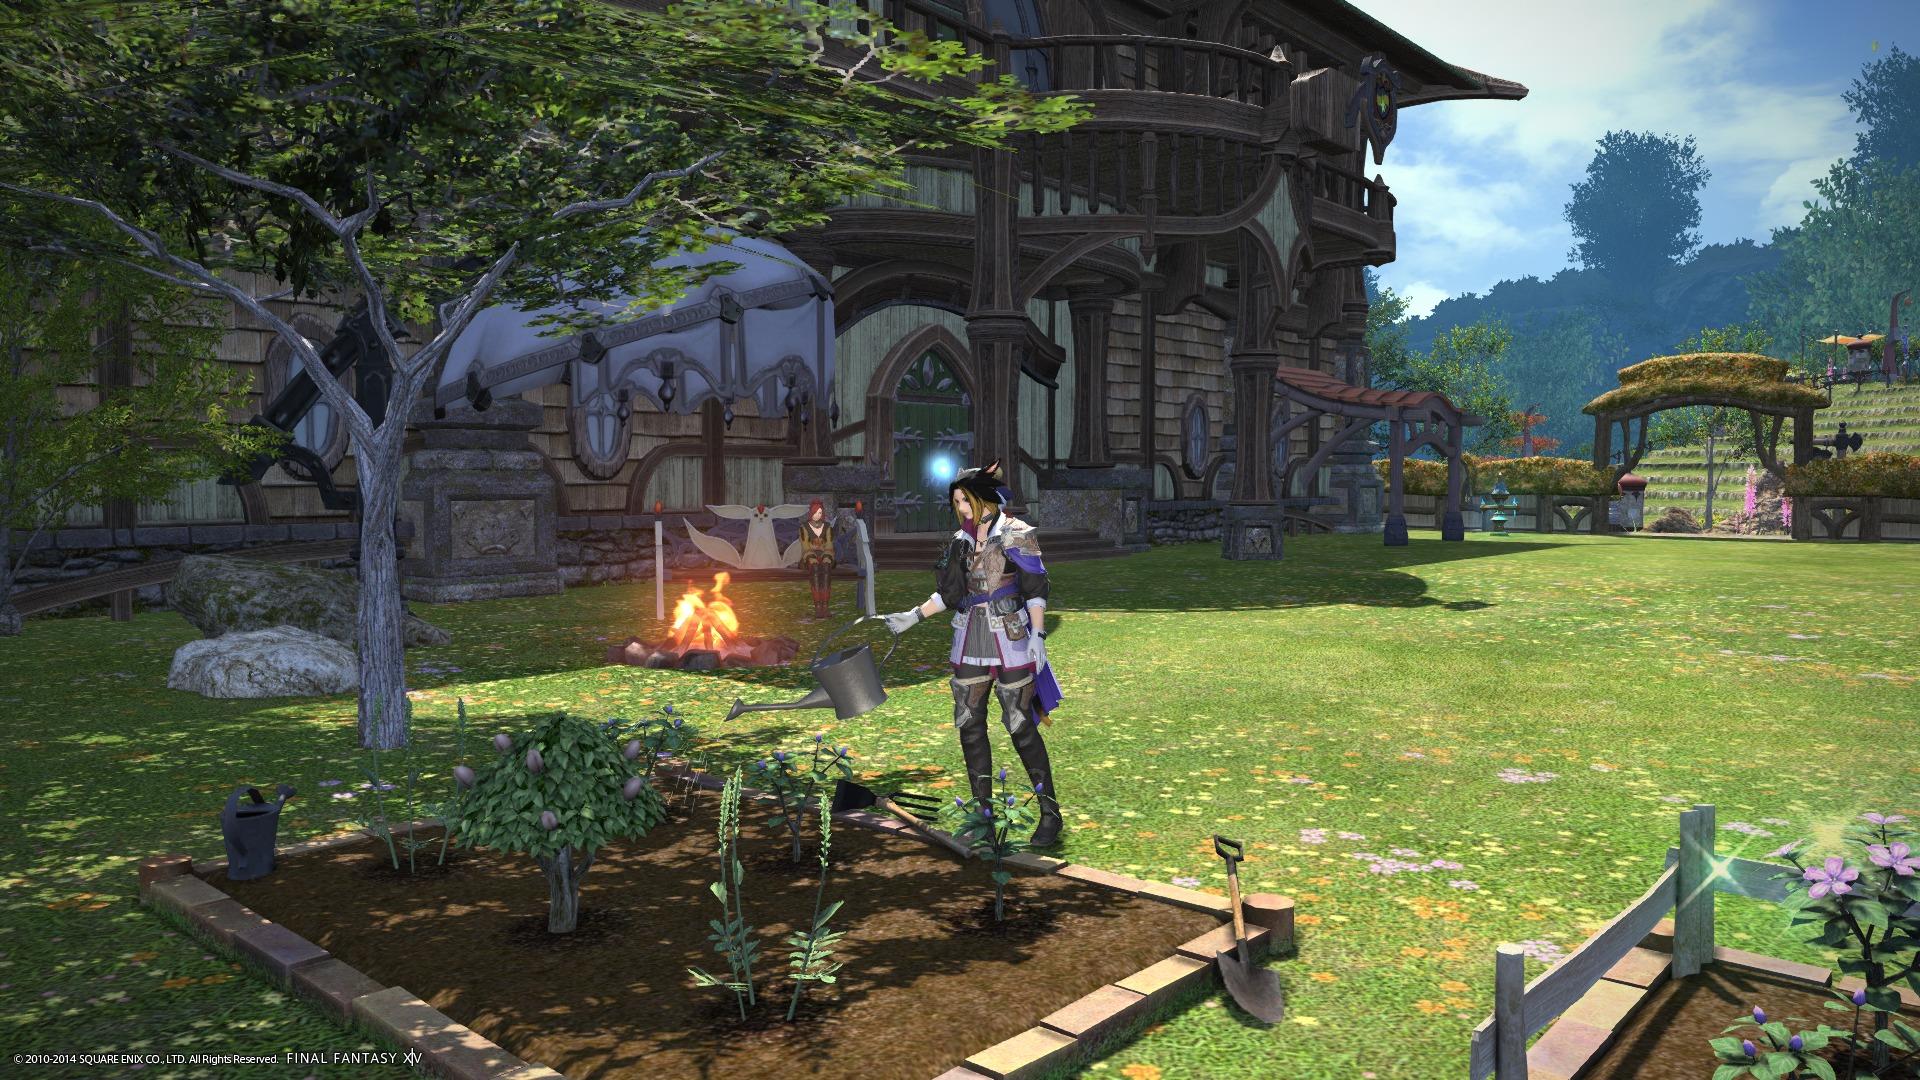 Fok Nl Reviews Final Fantasy Xiv A Realm Reborn Ps4